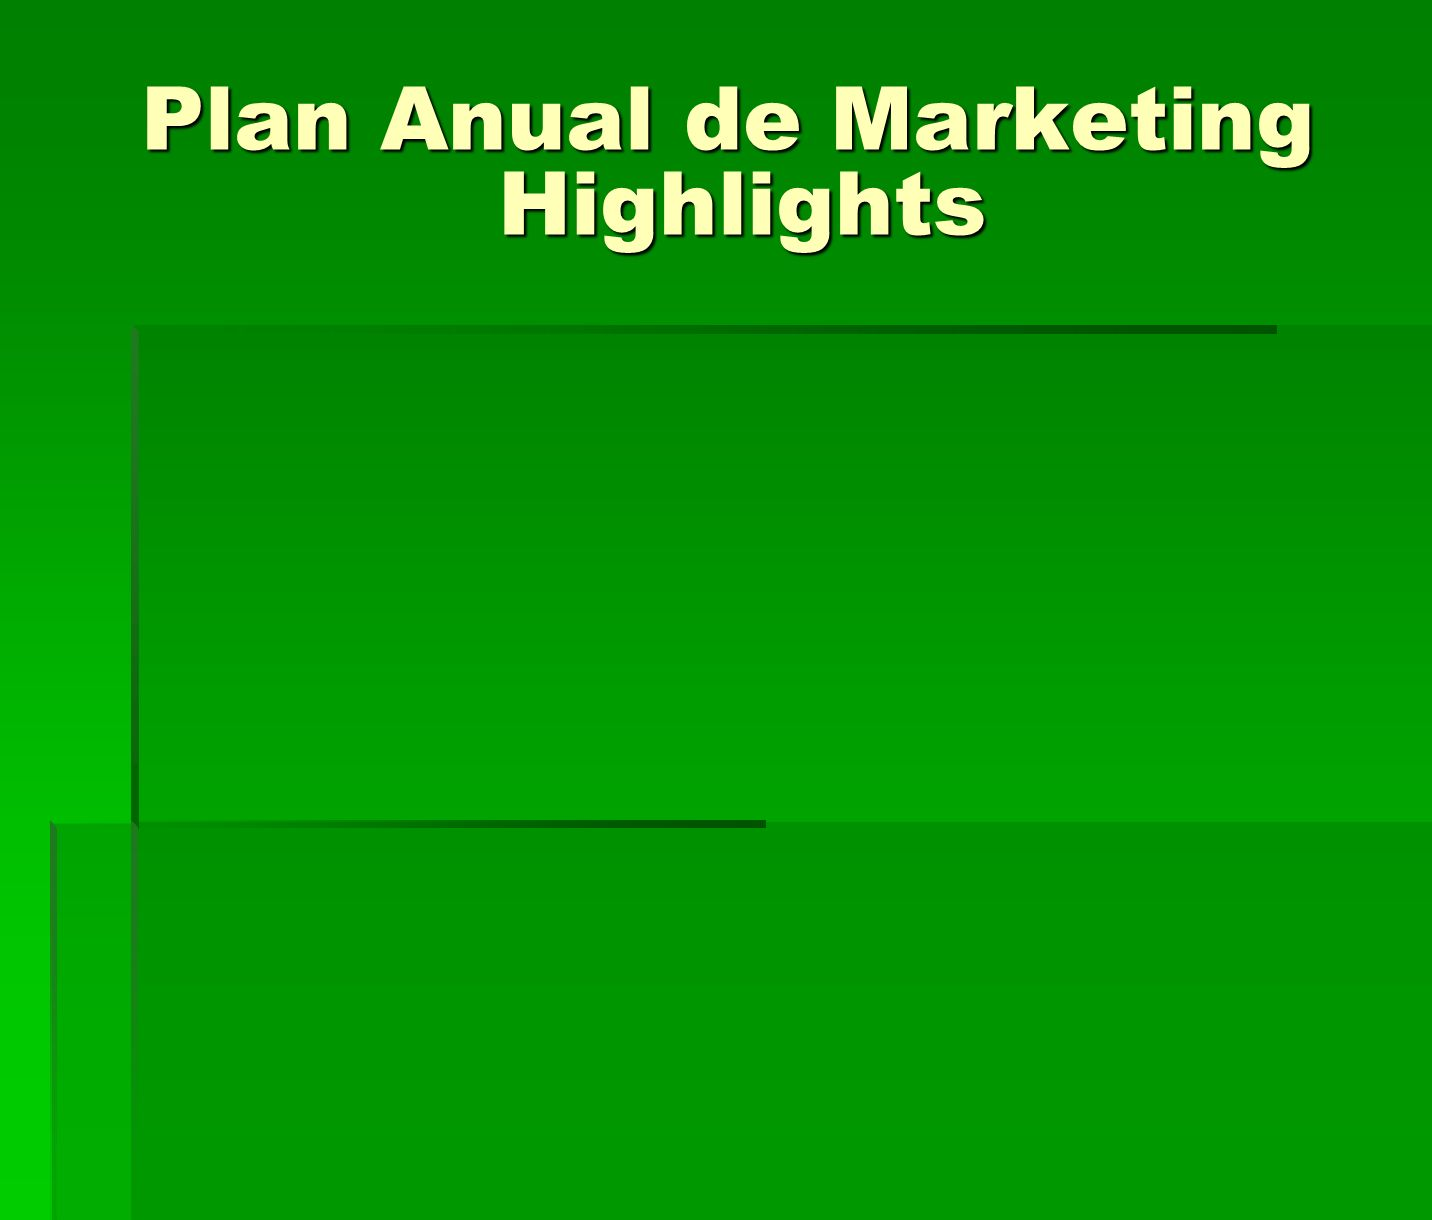 Plan Anual de Marketing Highlights